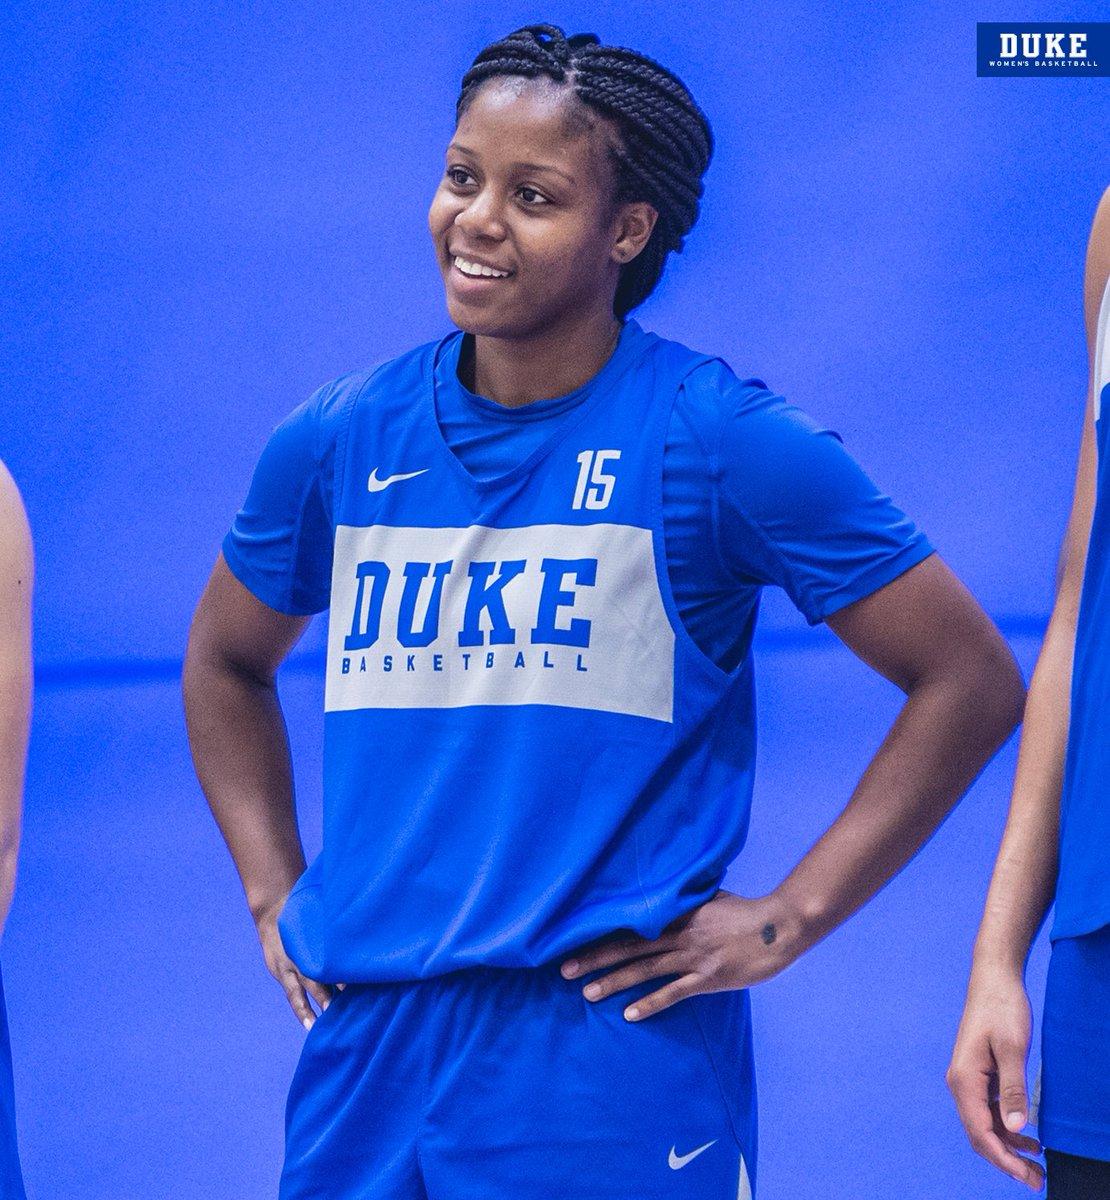 best service 4d3ab eceba Duke Women's Basketball on Twitter: